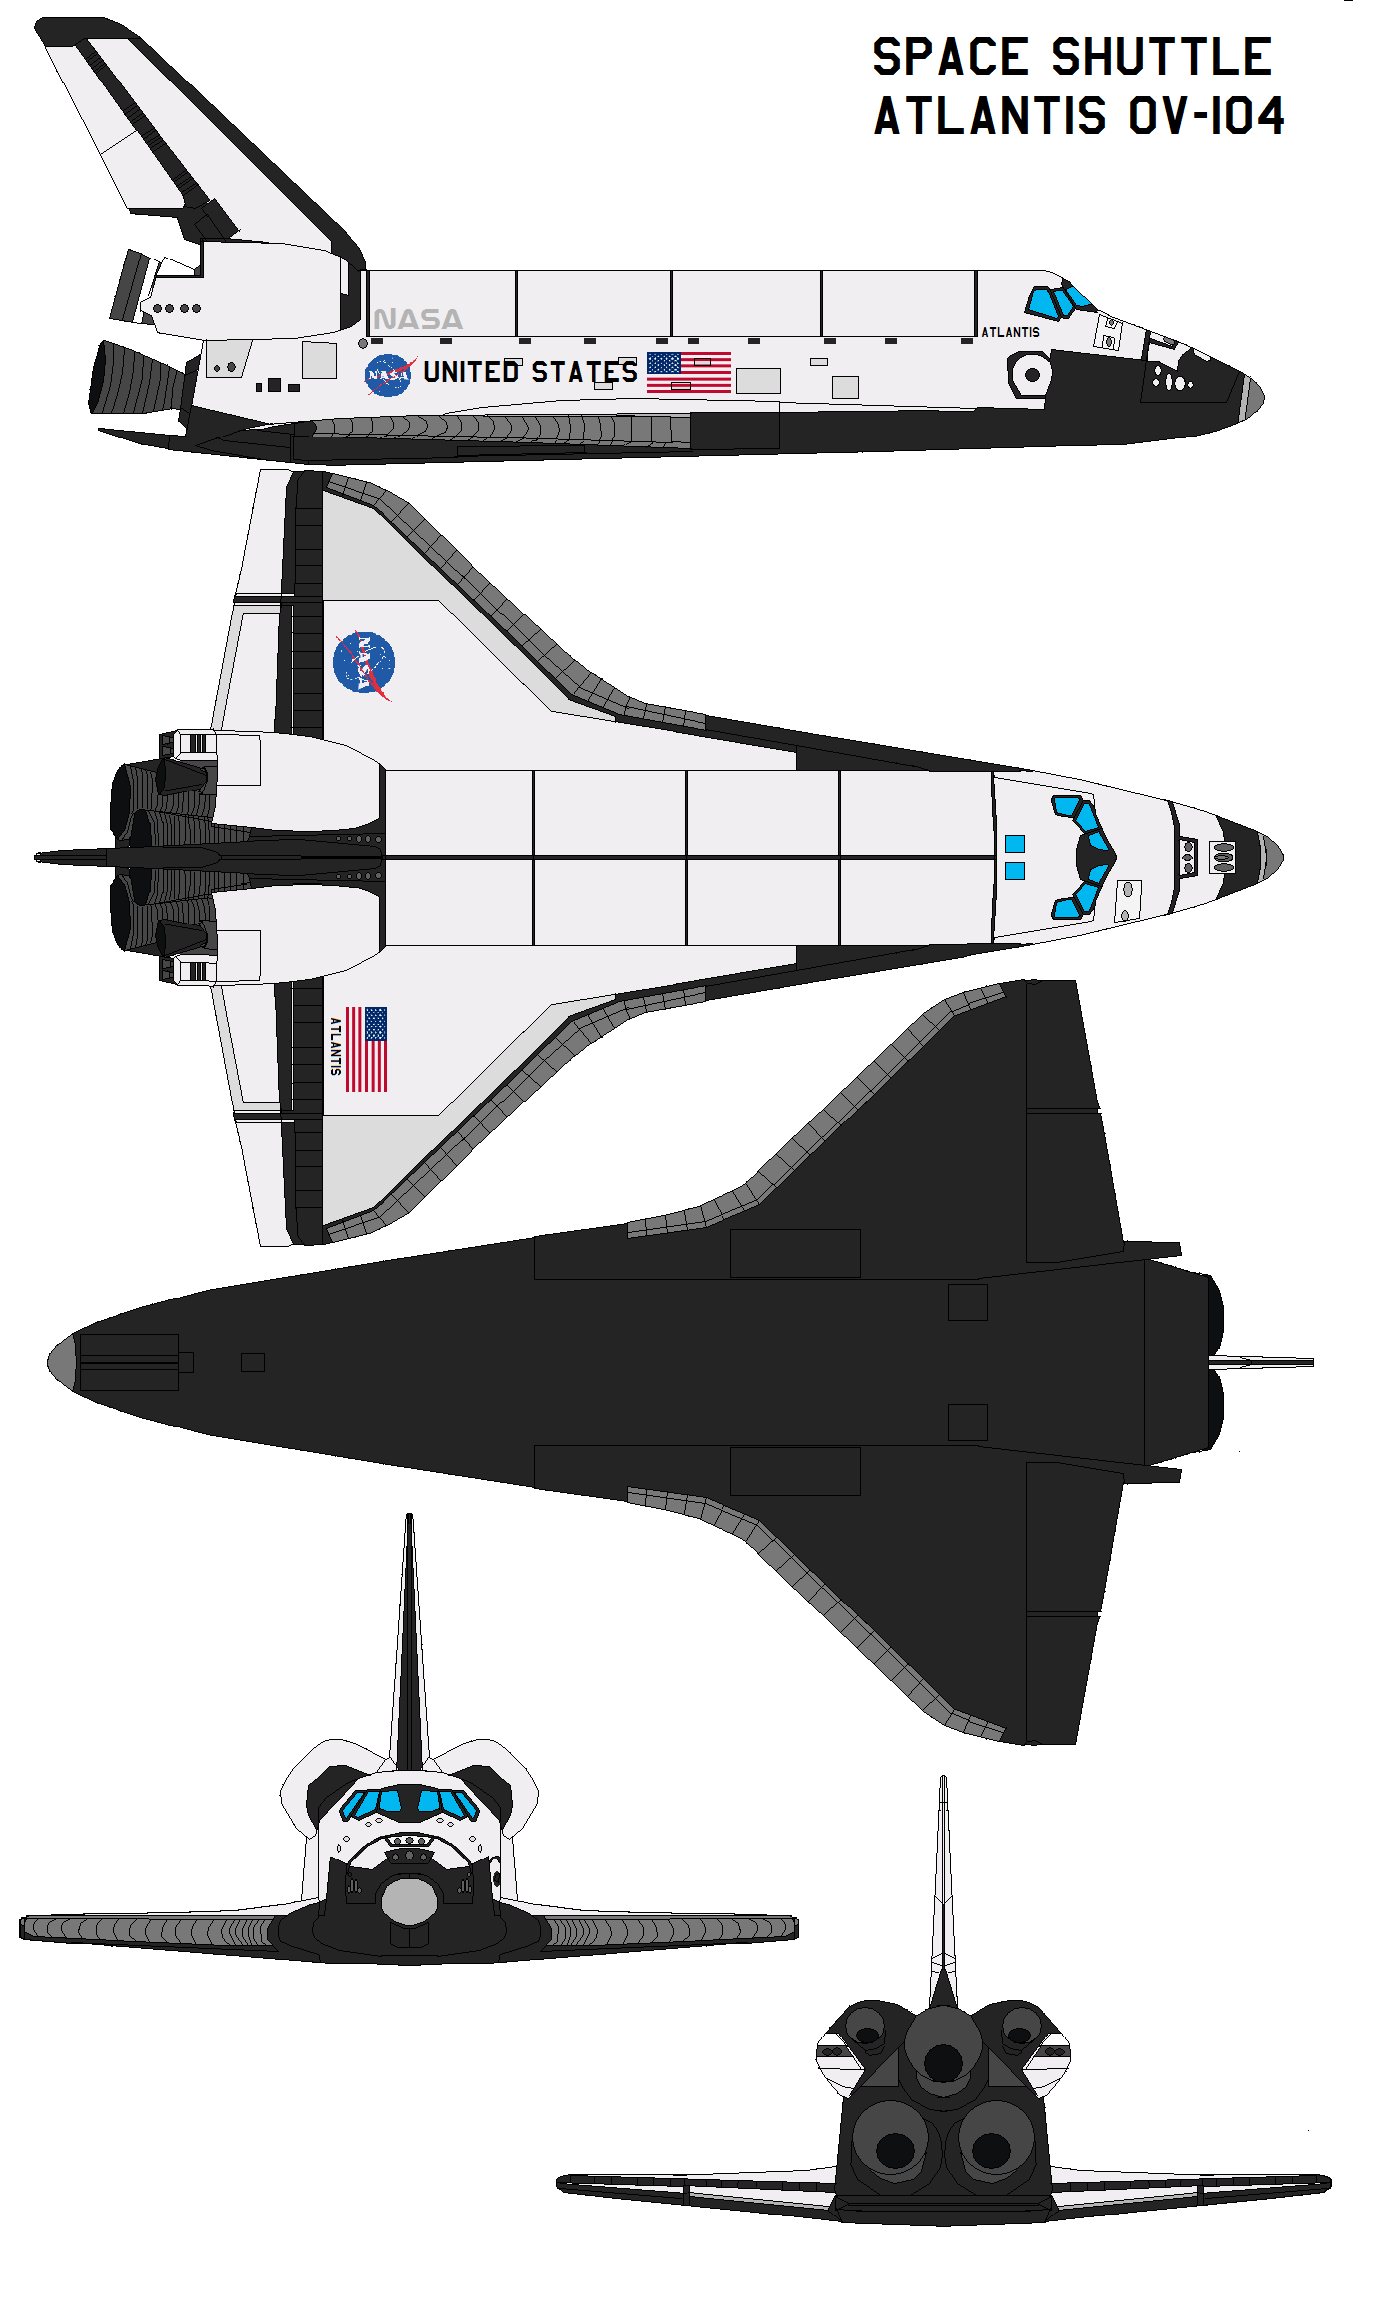 Space shuttle Atlantis OV-104 by bagera3005 on DeviantArt